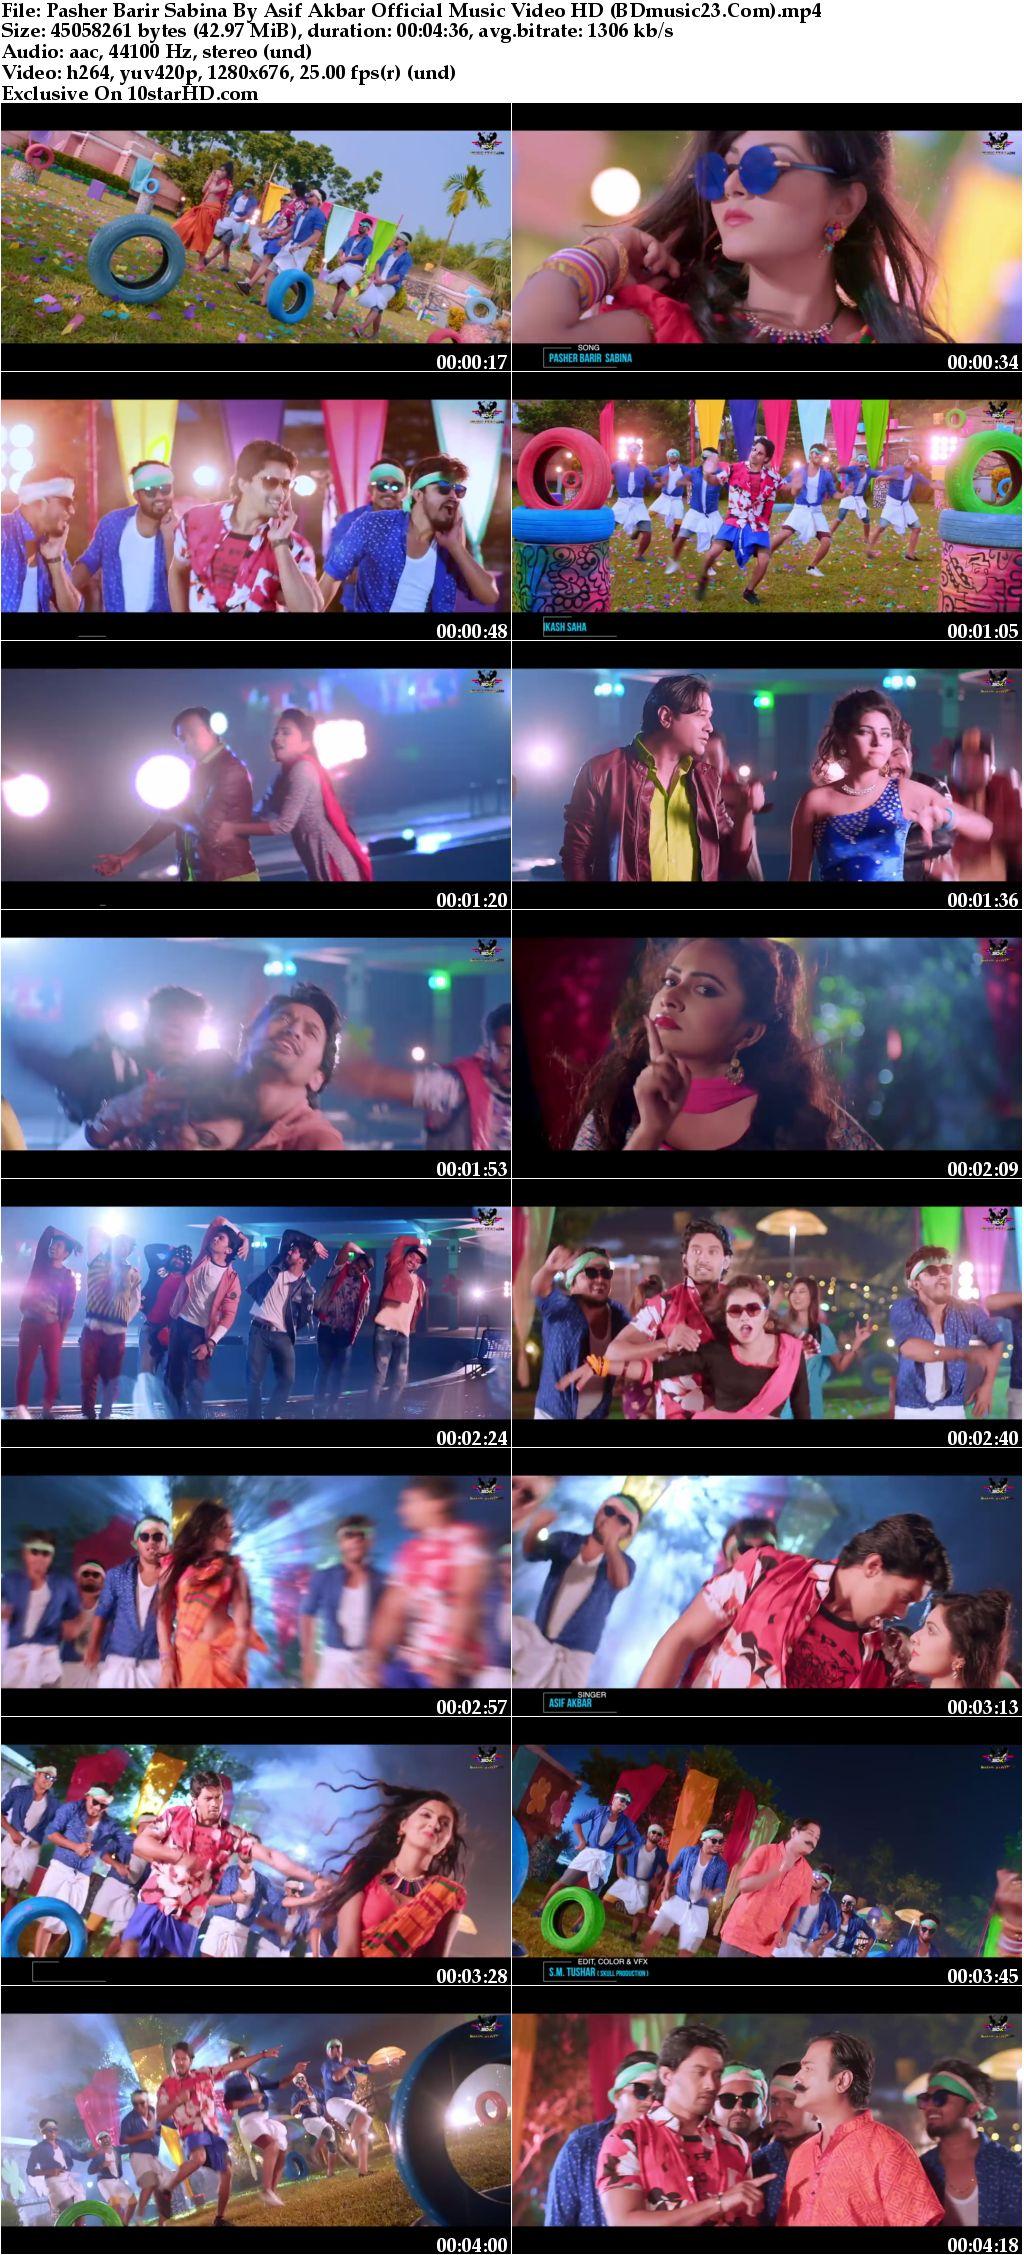 Pasher Barir Sabina By Asif Akbar Official Music Video (2018) HD